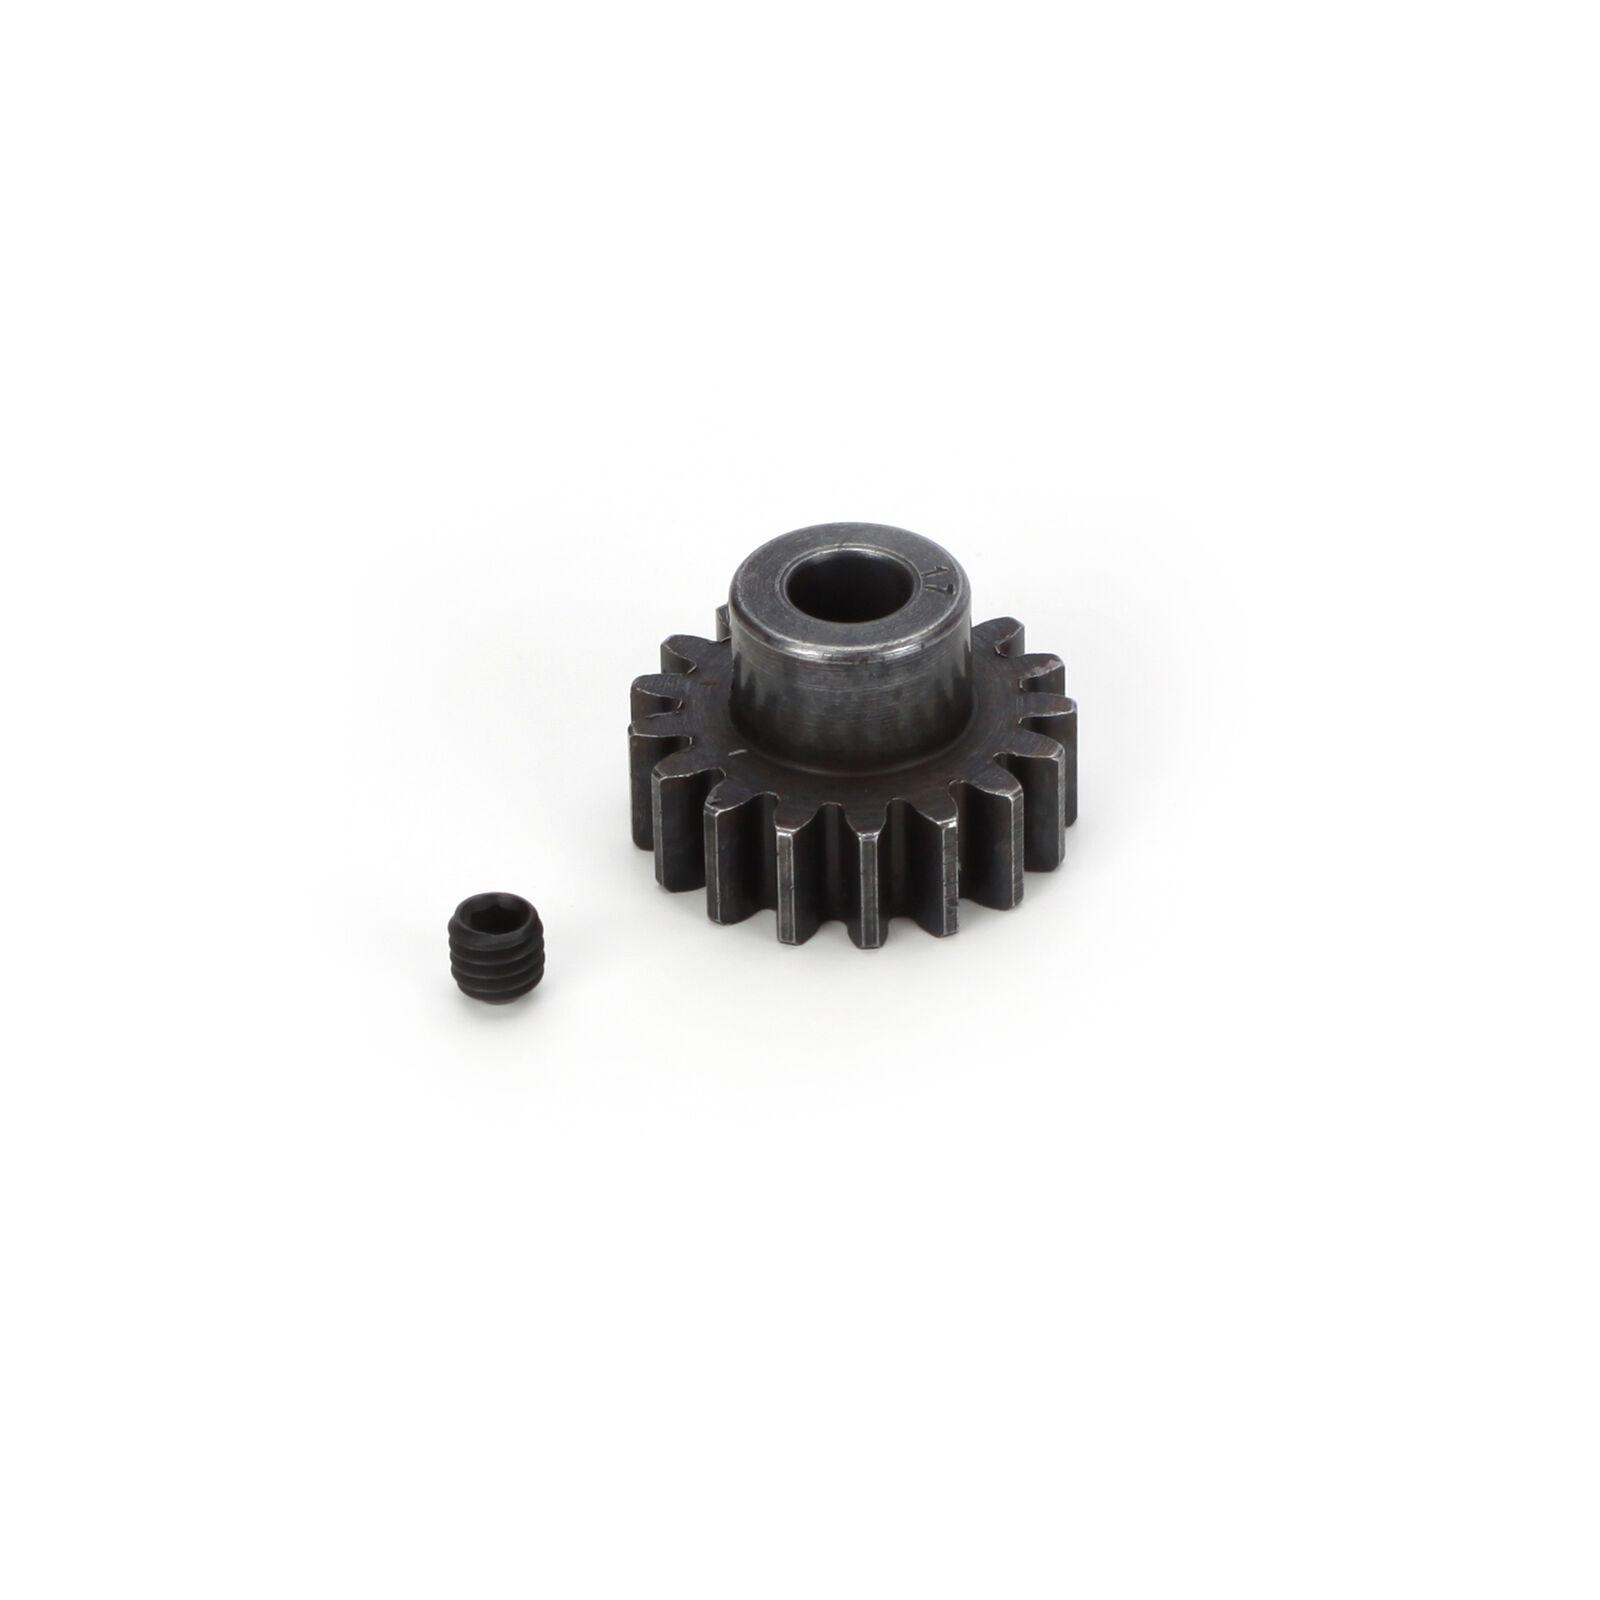 Extra Hard Steel 5mm Bore 1 Module Pinion, 17T